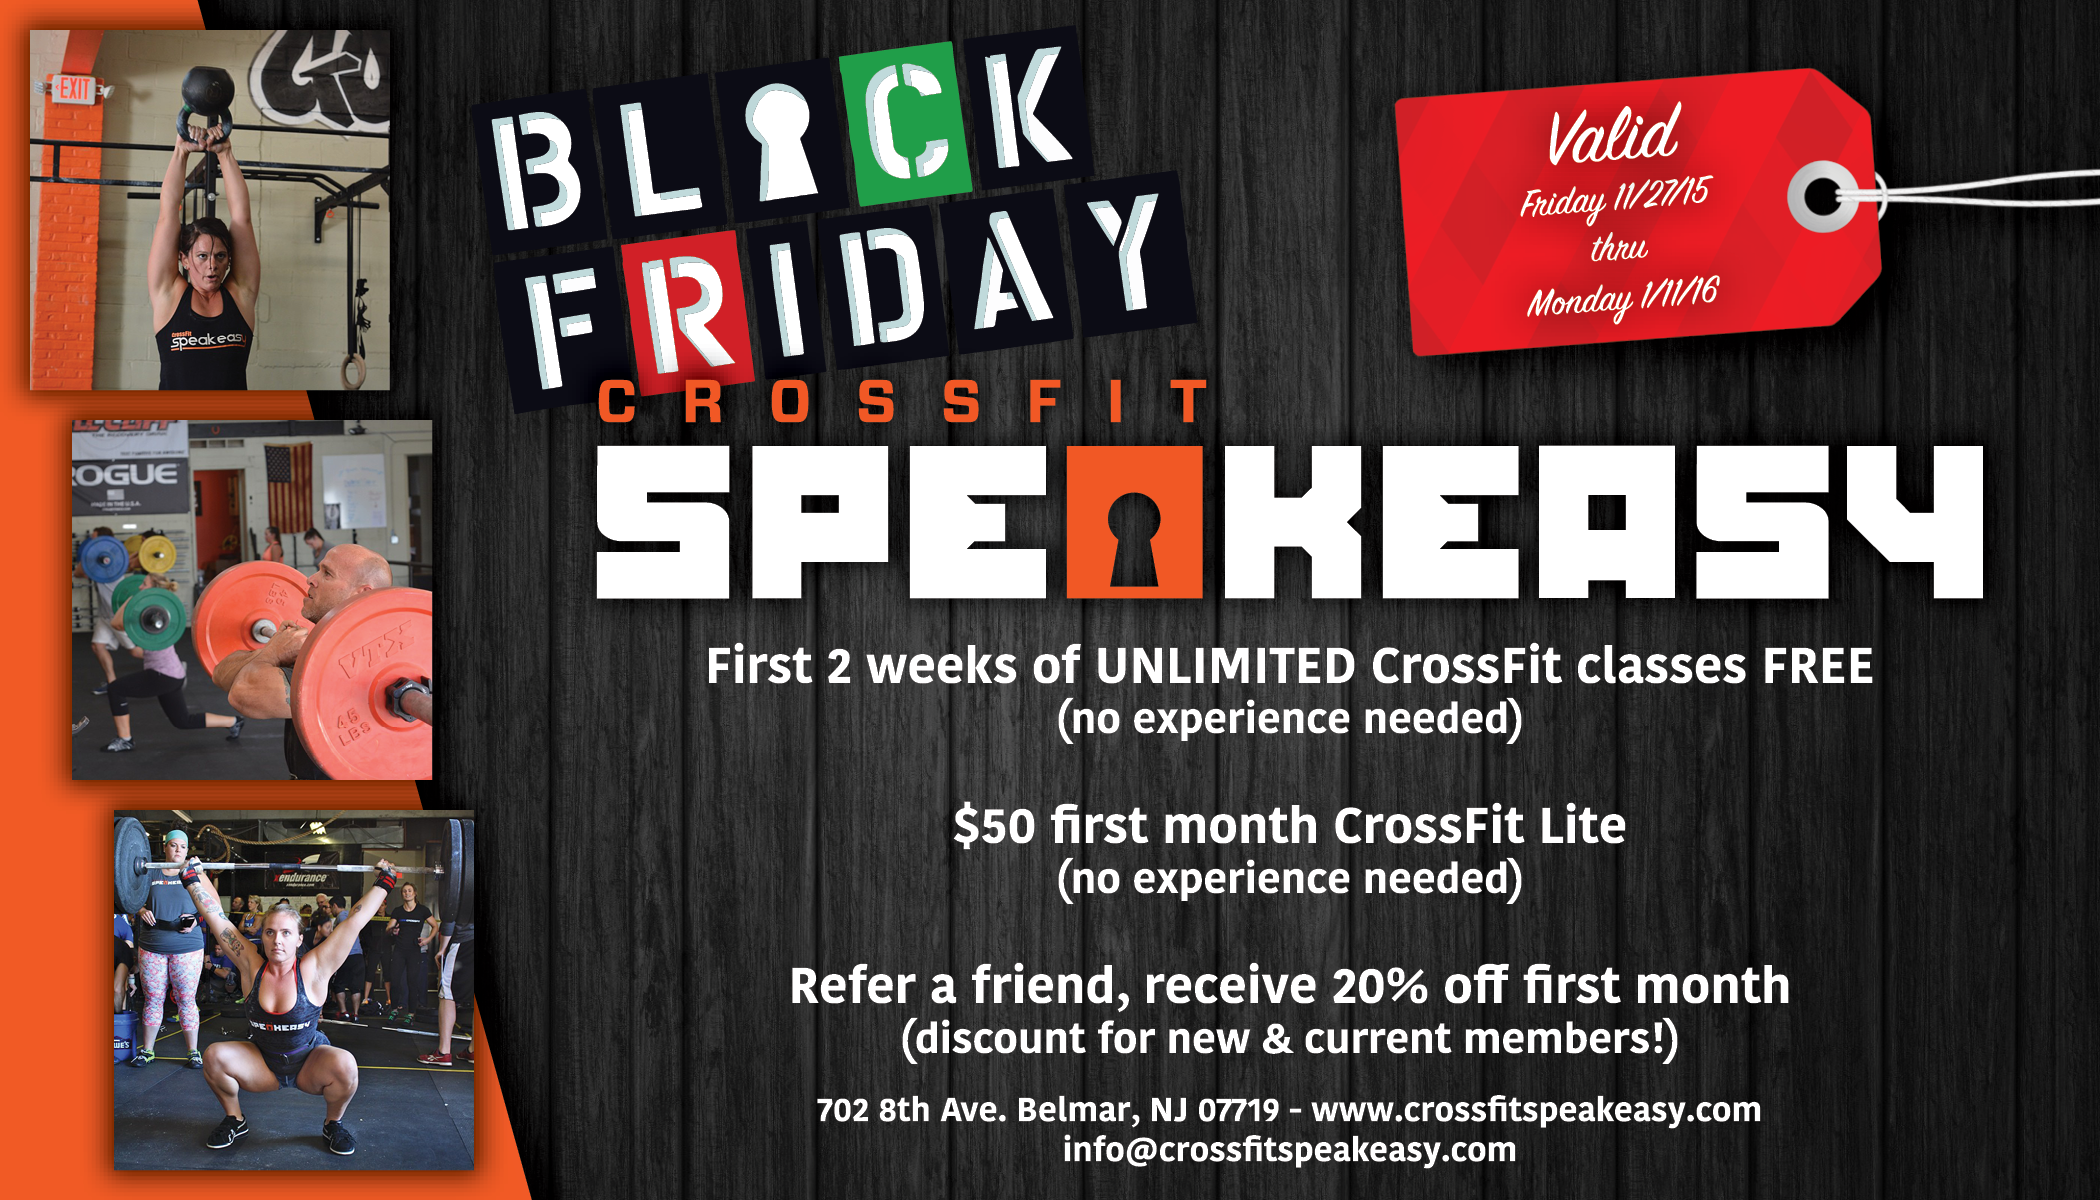 11 28 15 Holiday Deals Discounts Crossfit Speakeasy